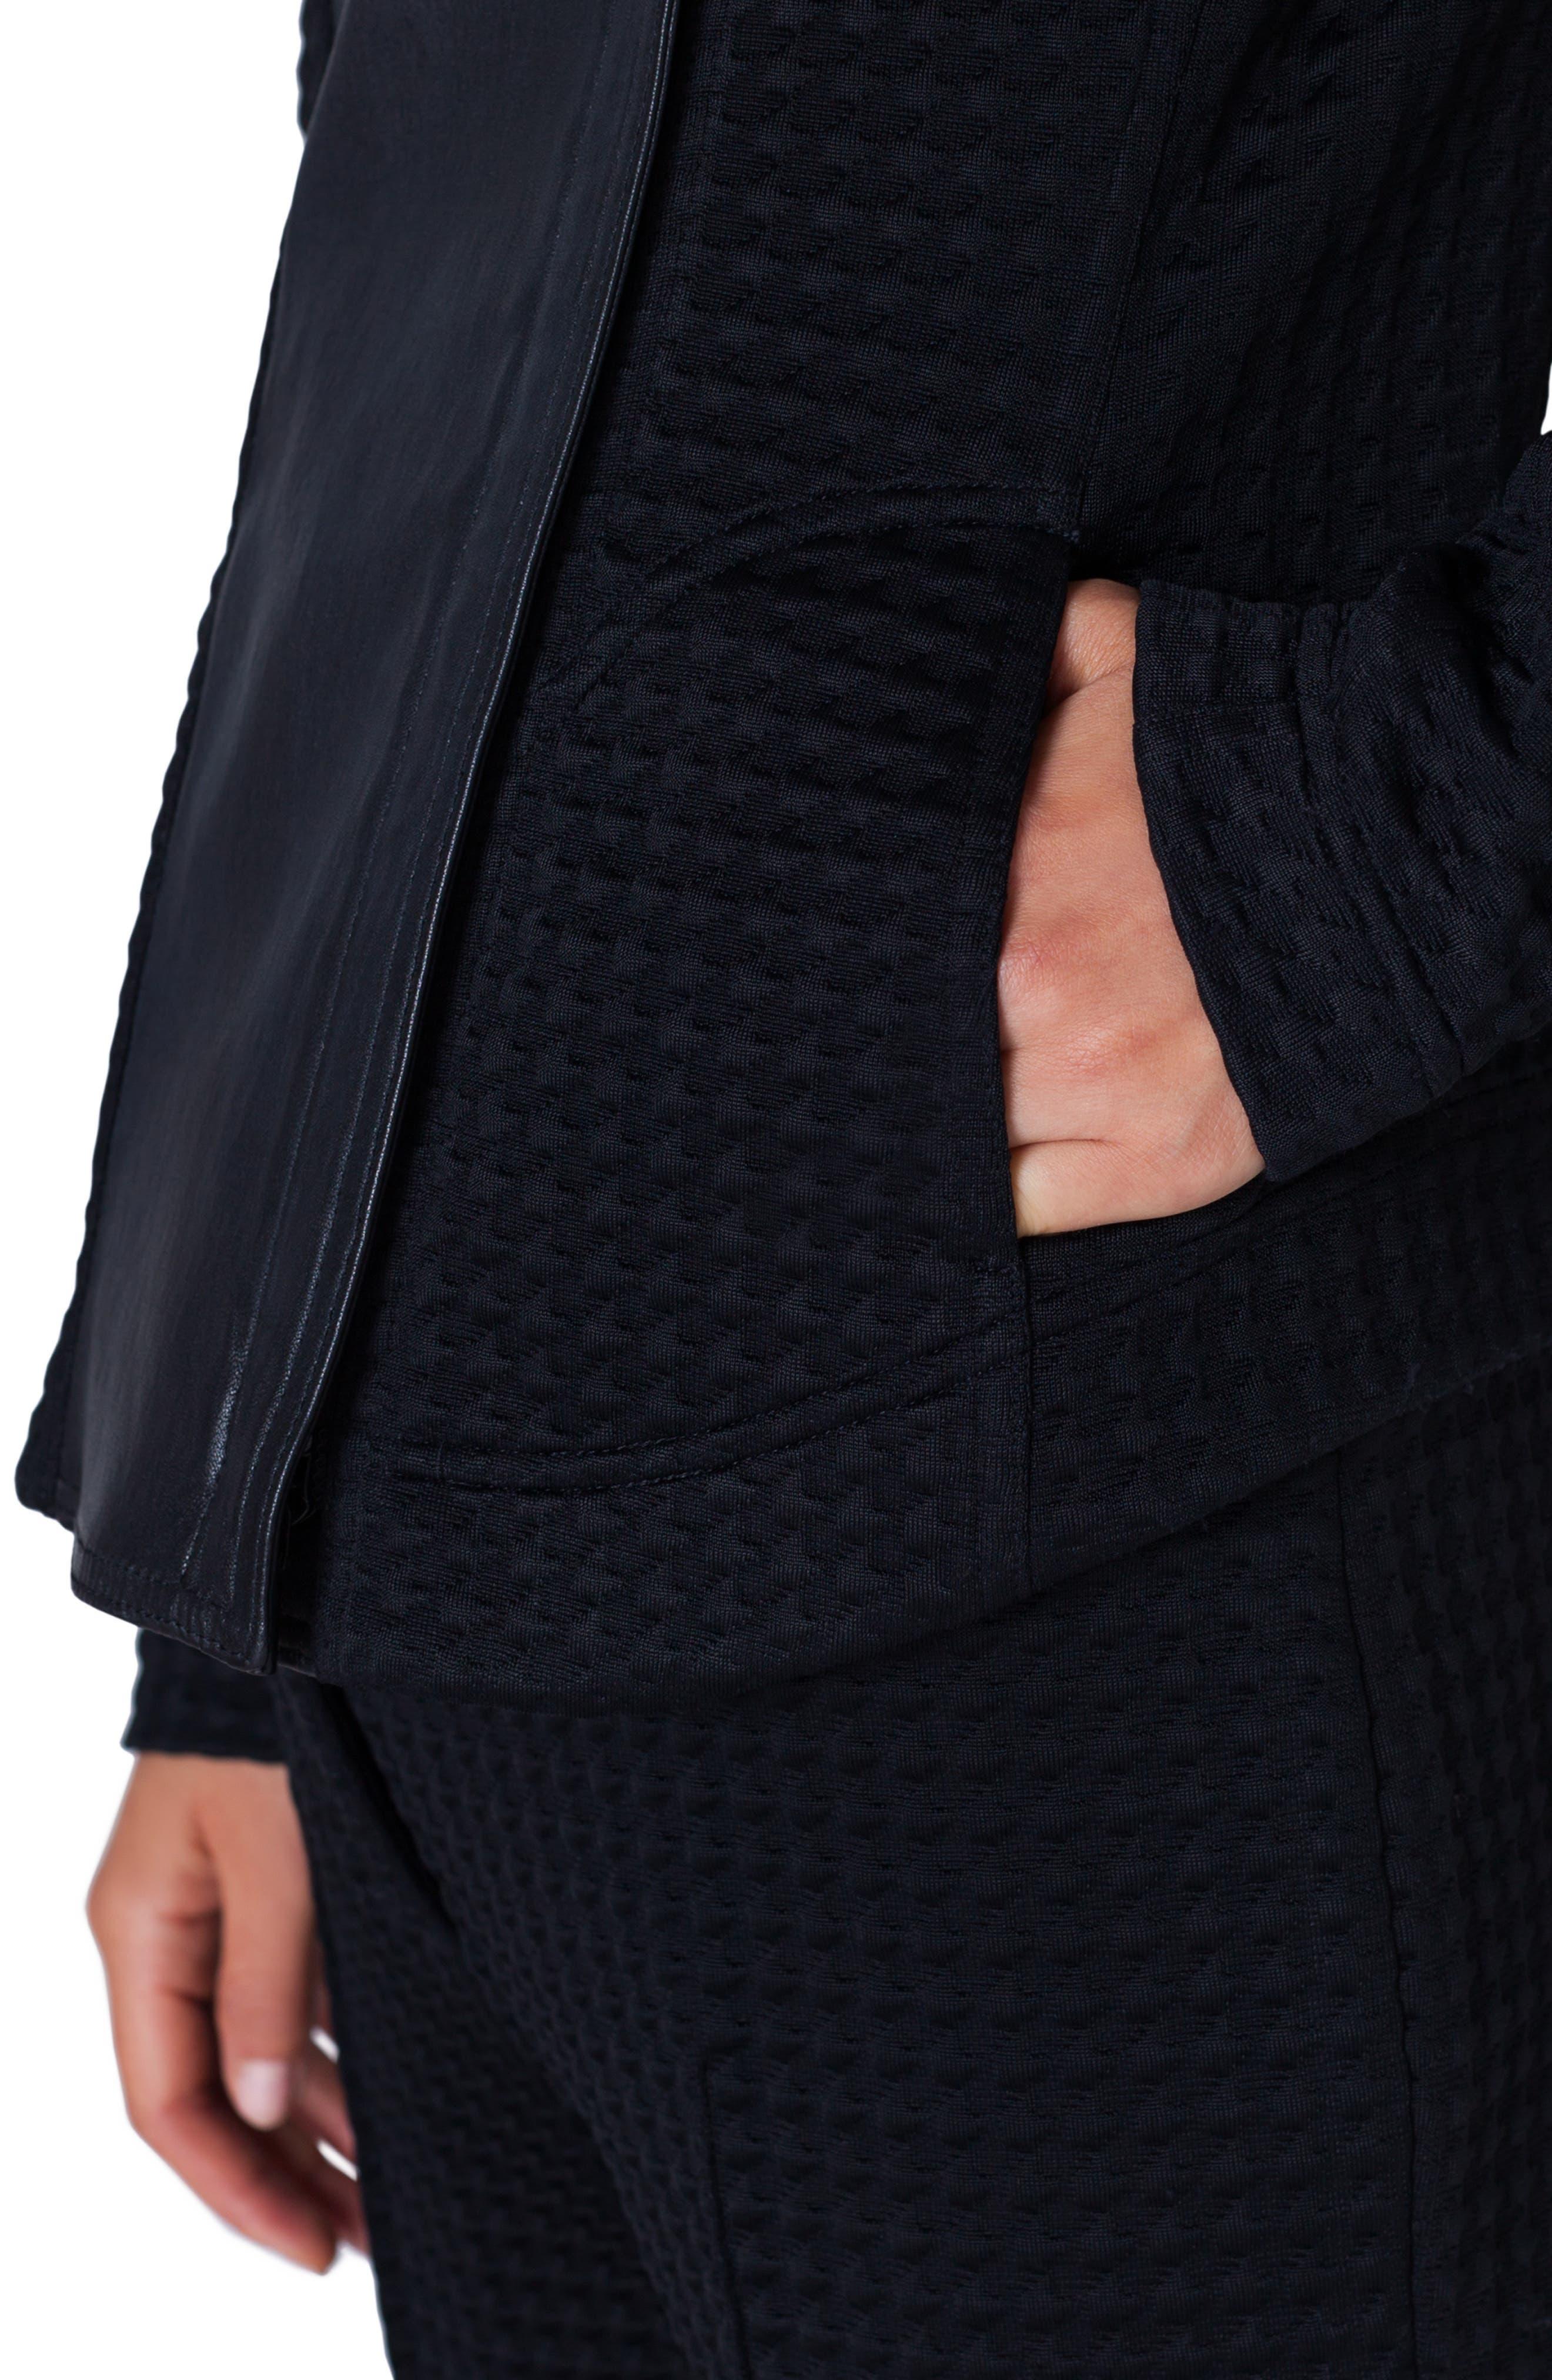 AKRIS PUNTO, Leather & Jersey Biker Jacket, Alternate thumbnail 4, color, NERO